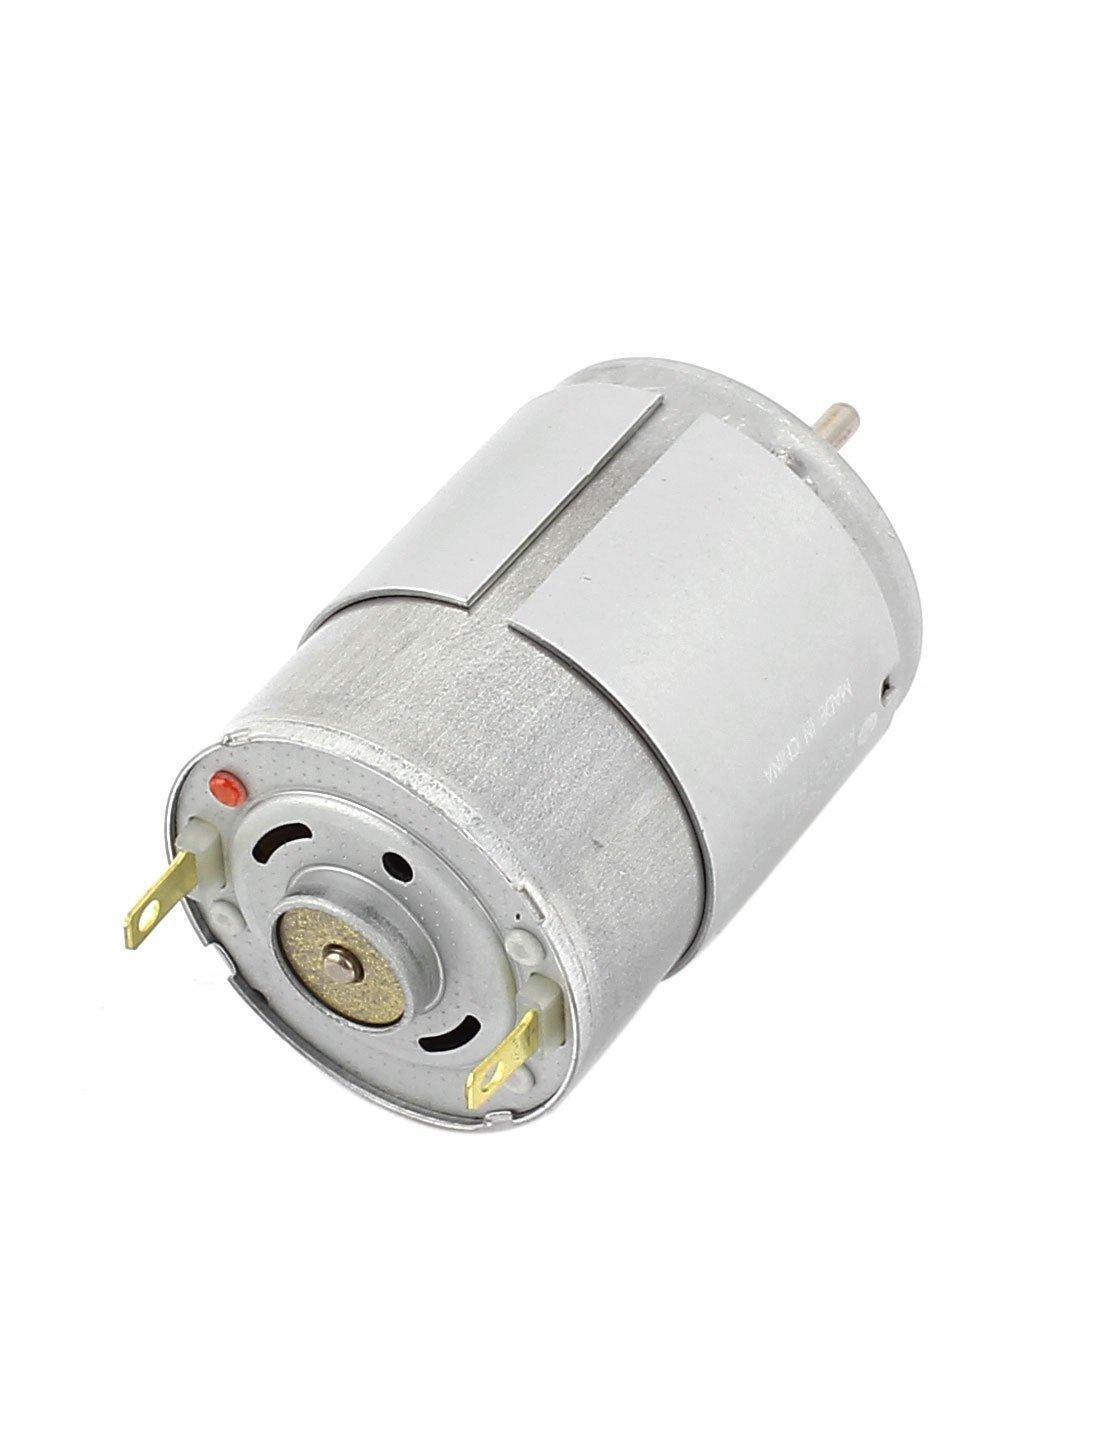 Motor 6V 22000RPM Secador de pelo de alta Troque eléctrico Mini vibración DC - - Amazon.com